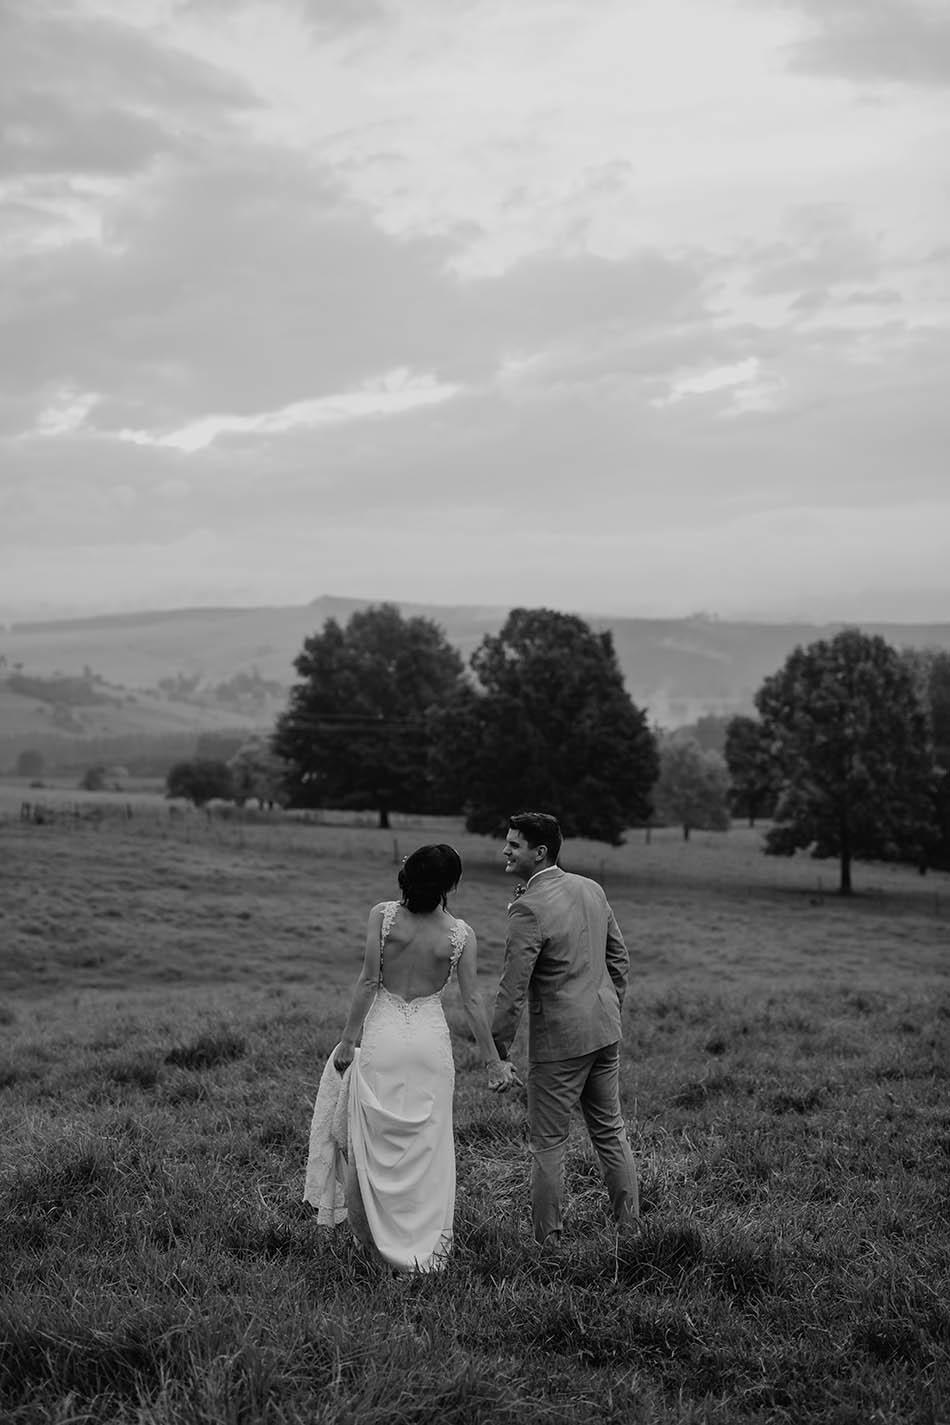 Rustic Barn Wedding Corrie Lynn Farm - Corrie Lynn Farm - Destination Wedding Photographer - Wedding Photographers Cape Town - Duane Smith Photography - Somerset West - Cape Town - Jemma & Nico-97